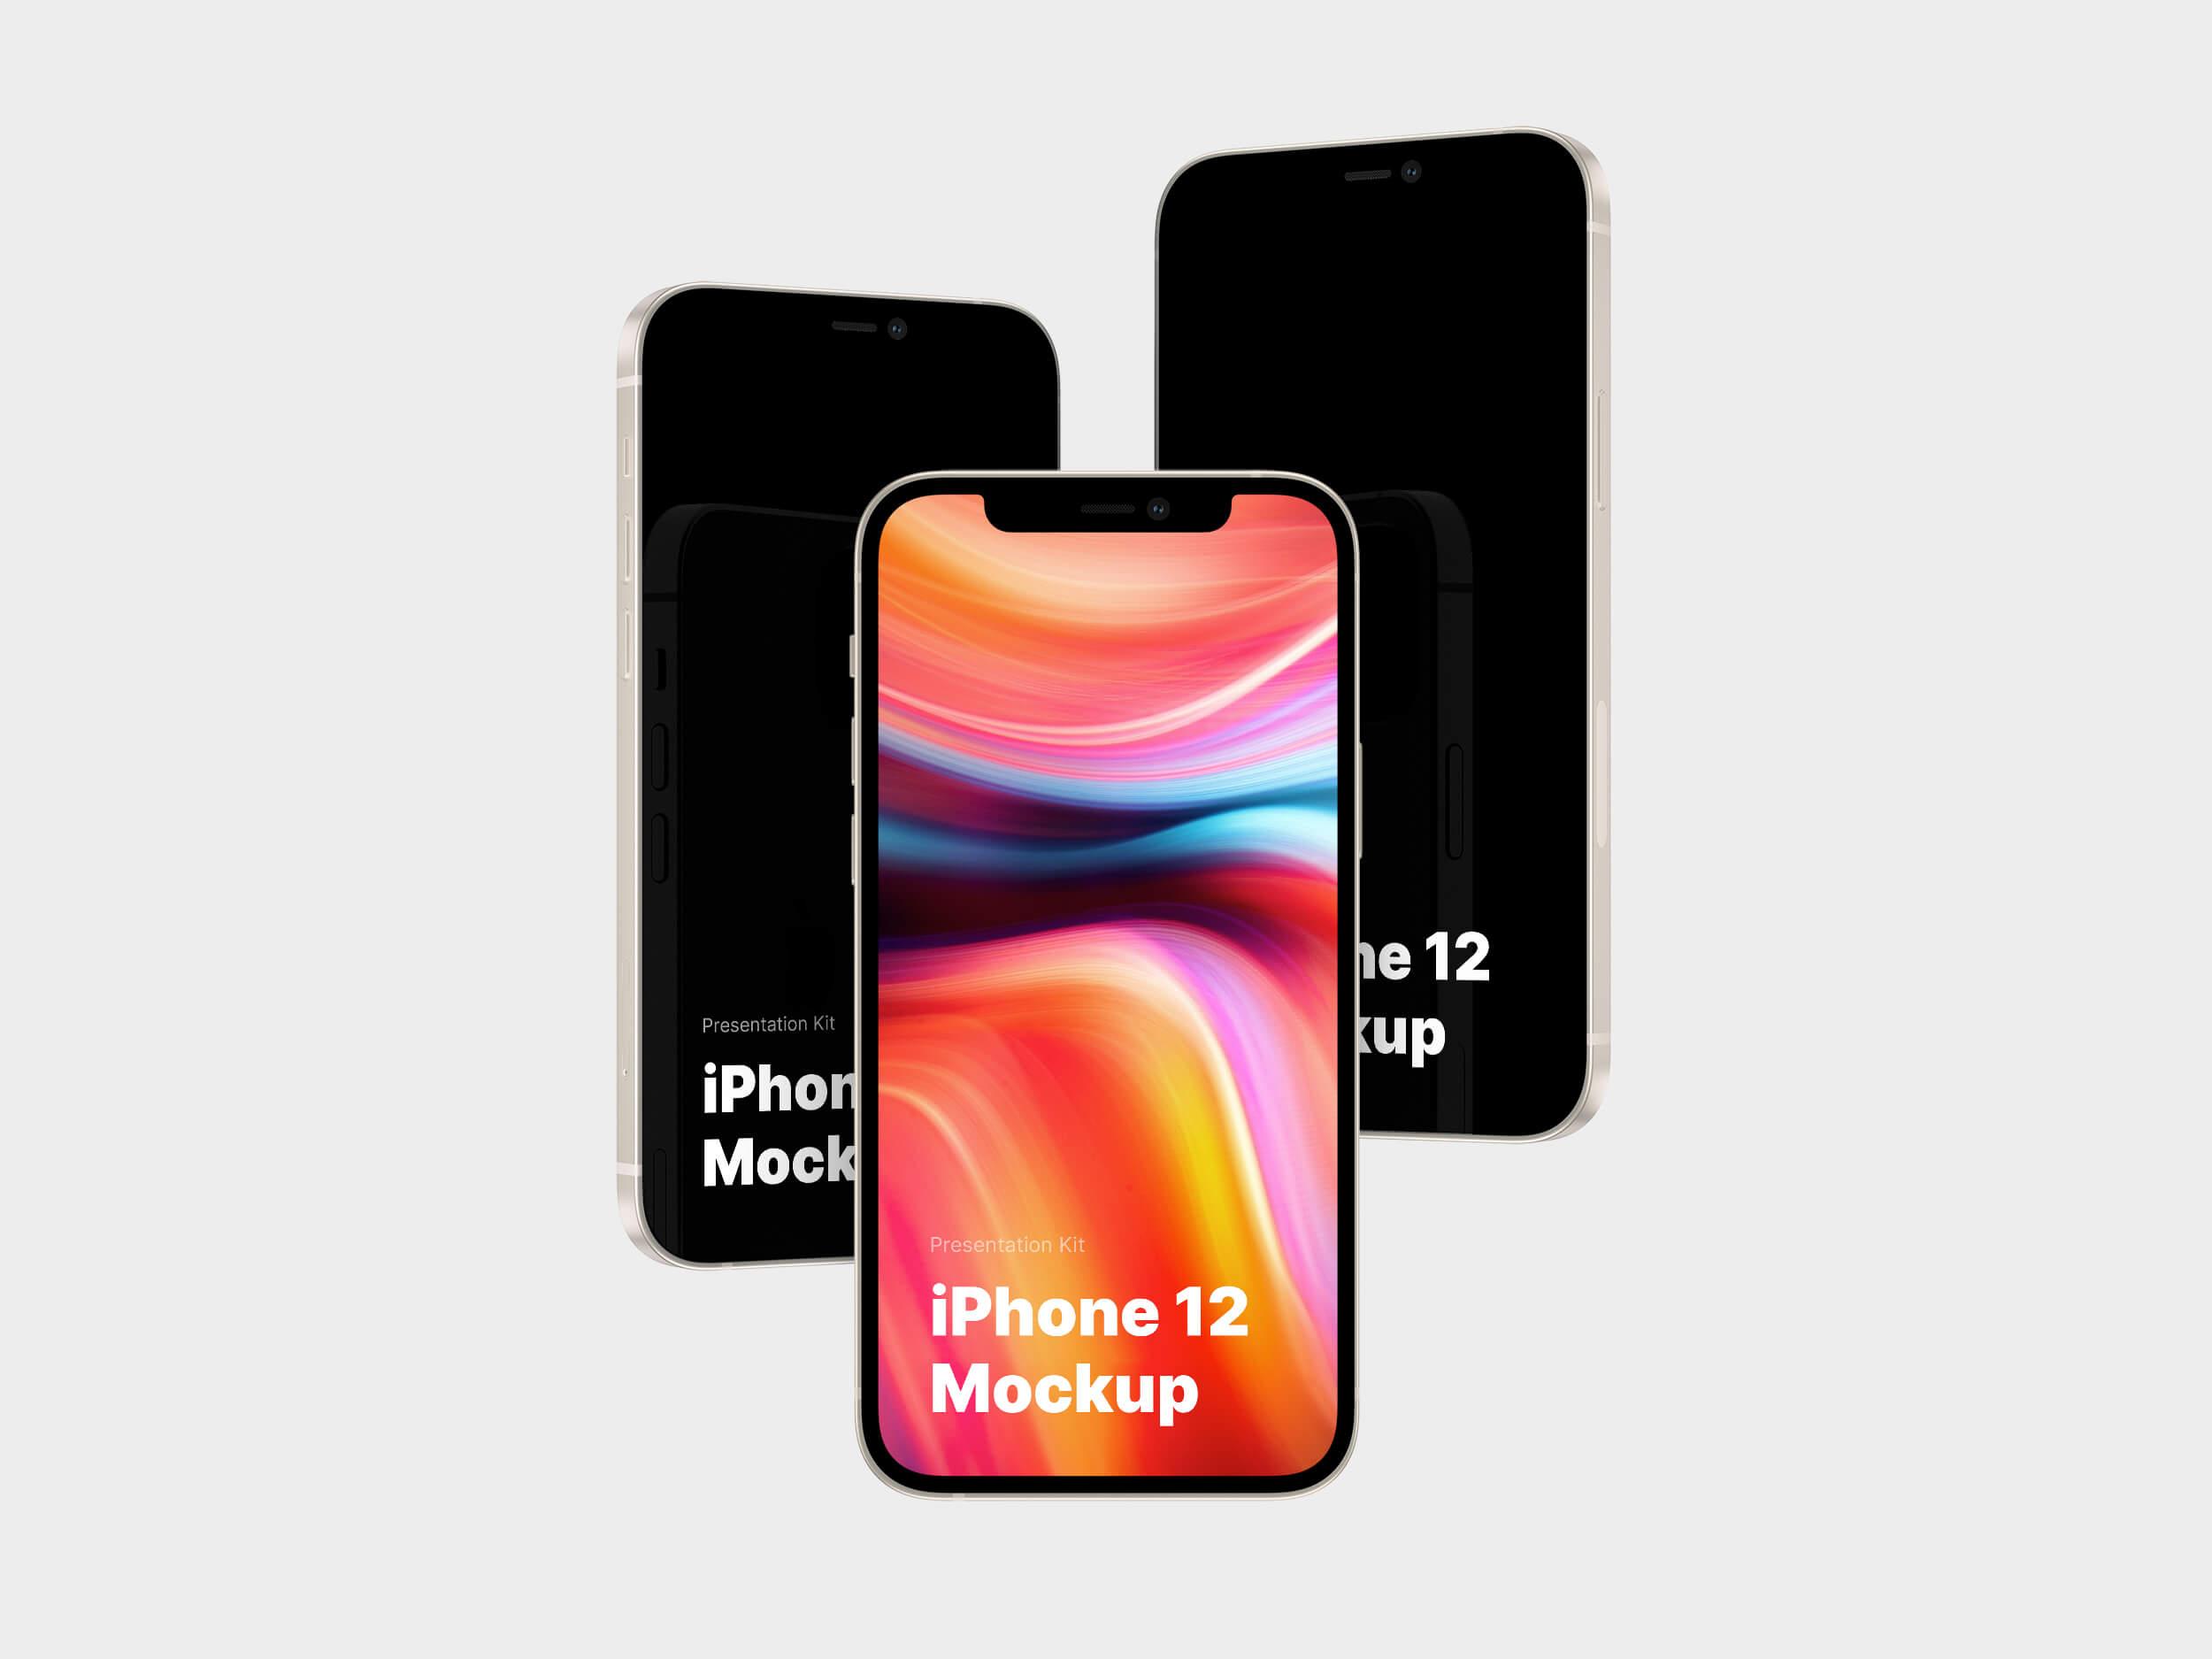 iPhone 12 Mockup